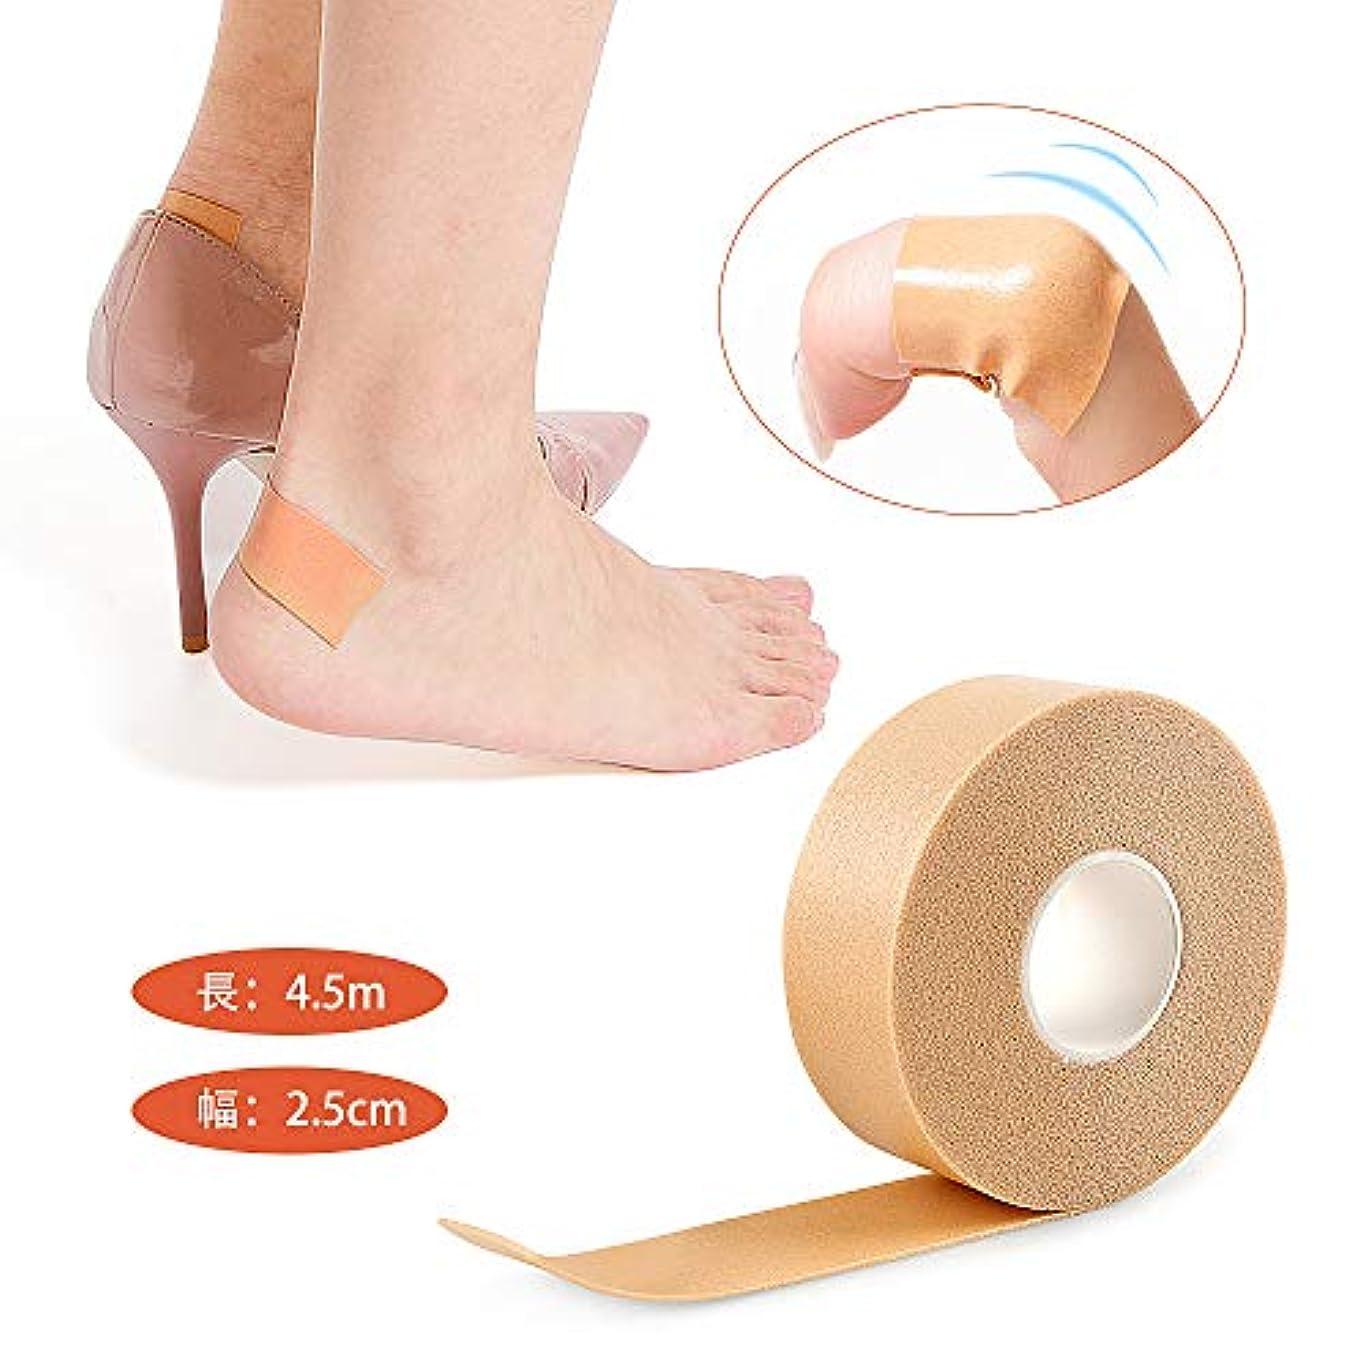 Azue 靴擦れ防止パッド かかとパッド 靴ずれ予防テープ テープ 防水素材 粘着 幅2.5cm×長4.5m 保護テープ 足用保護パッド 男女兼用